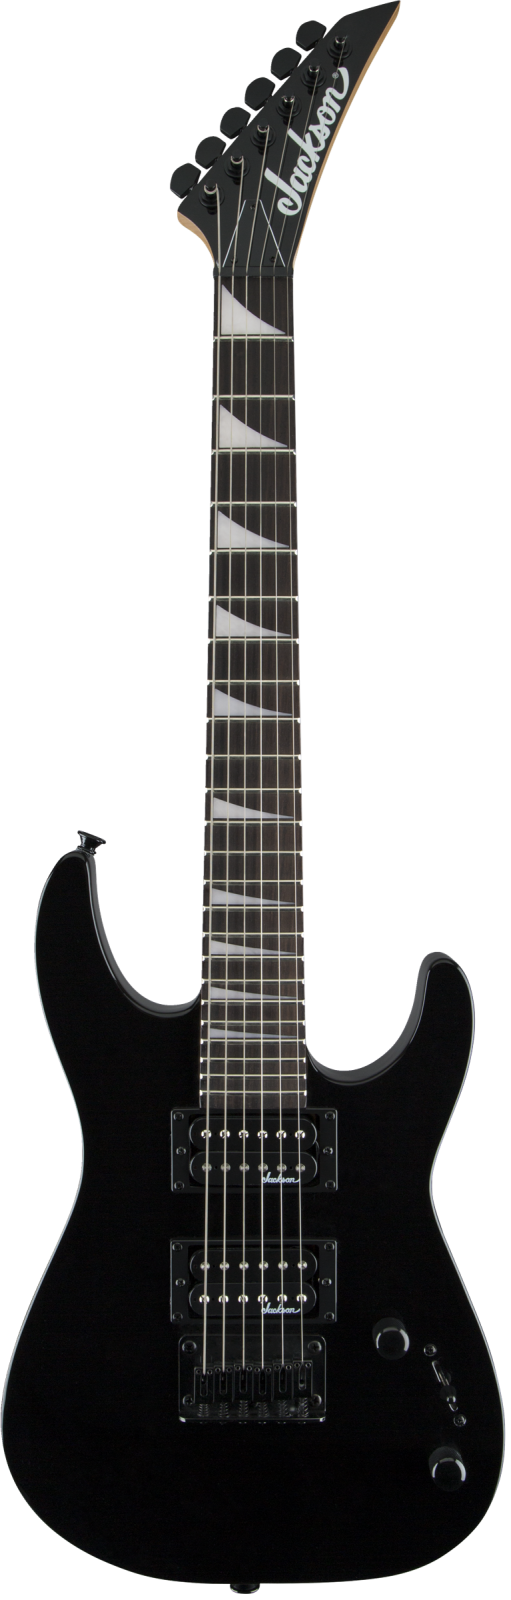 Jackson JS Series Dinky  Minion JS1X  Amaranth Fingerboard  Gloss Black